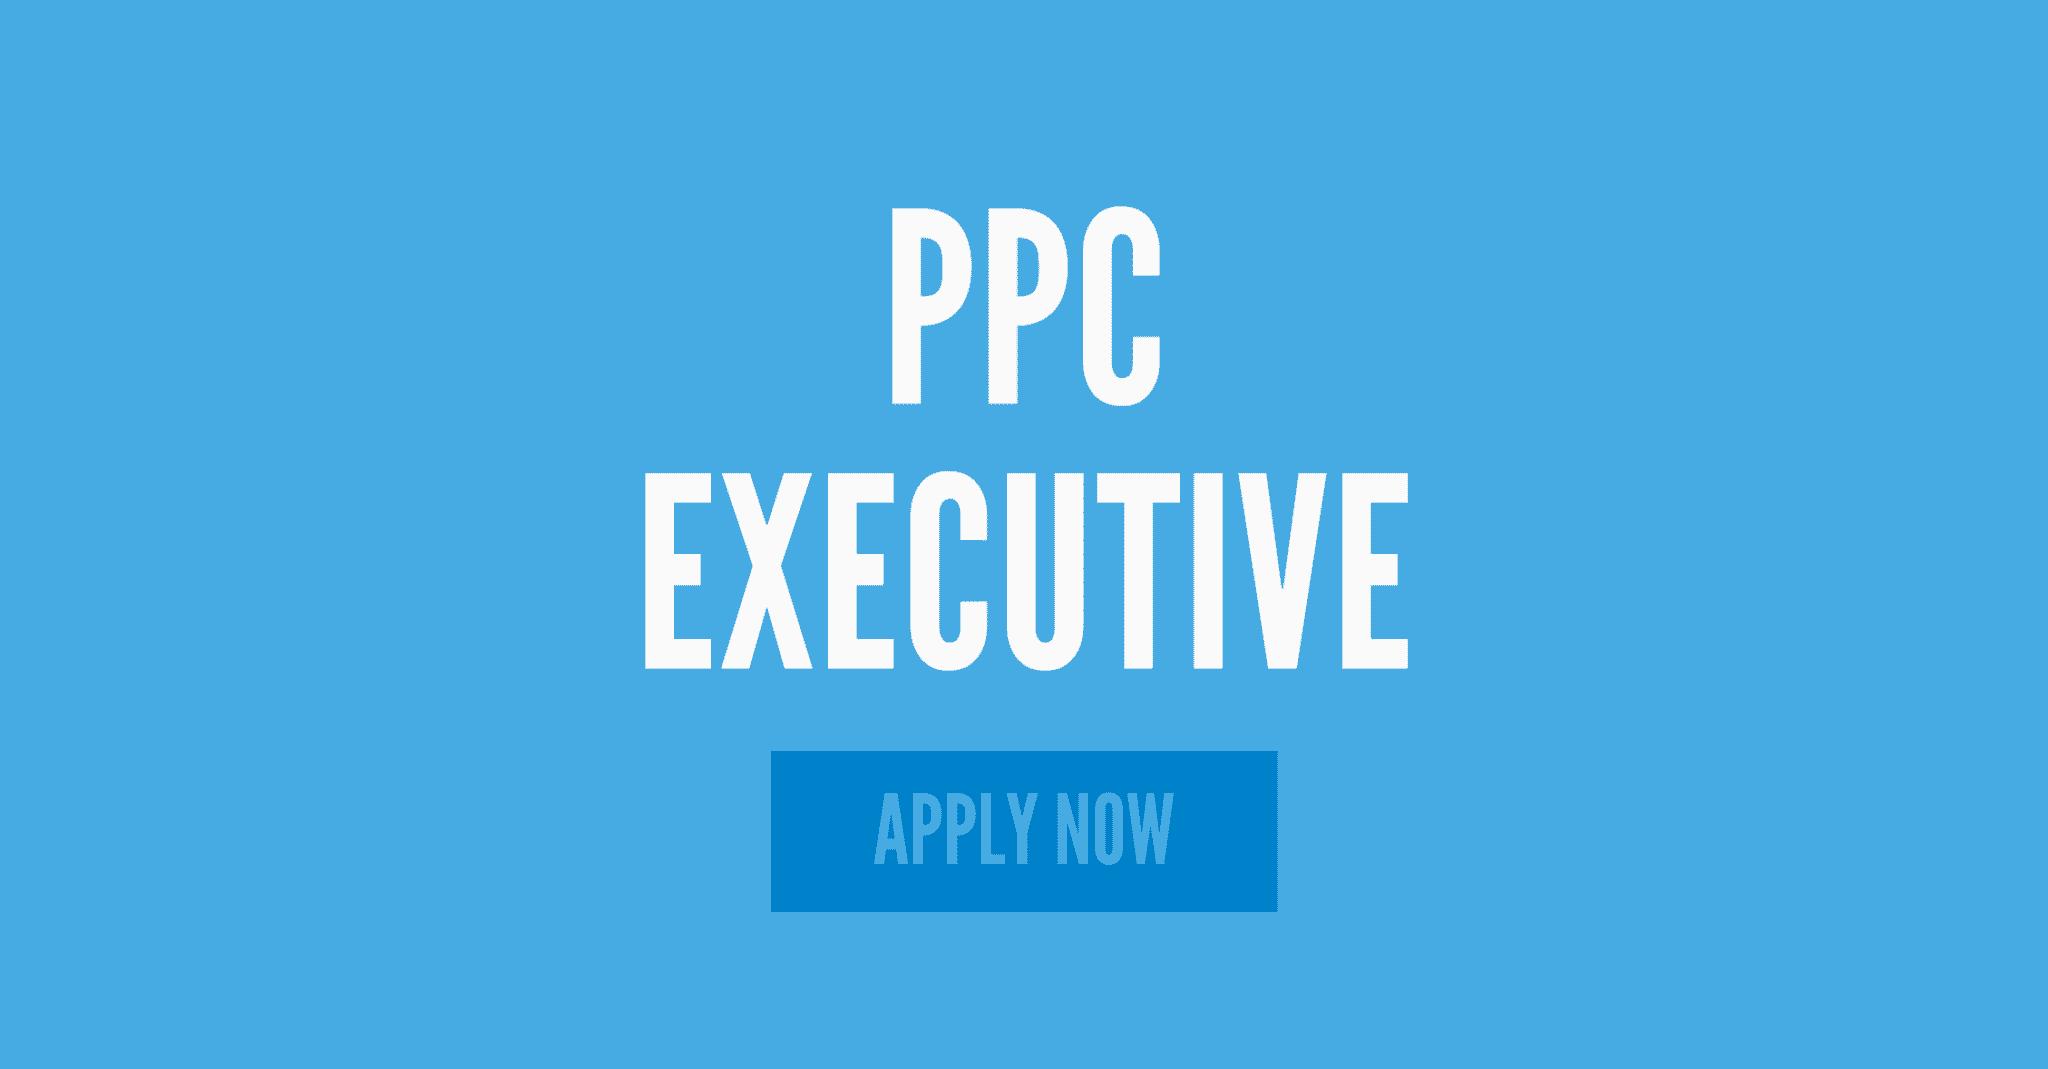 ppc & google ads executive